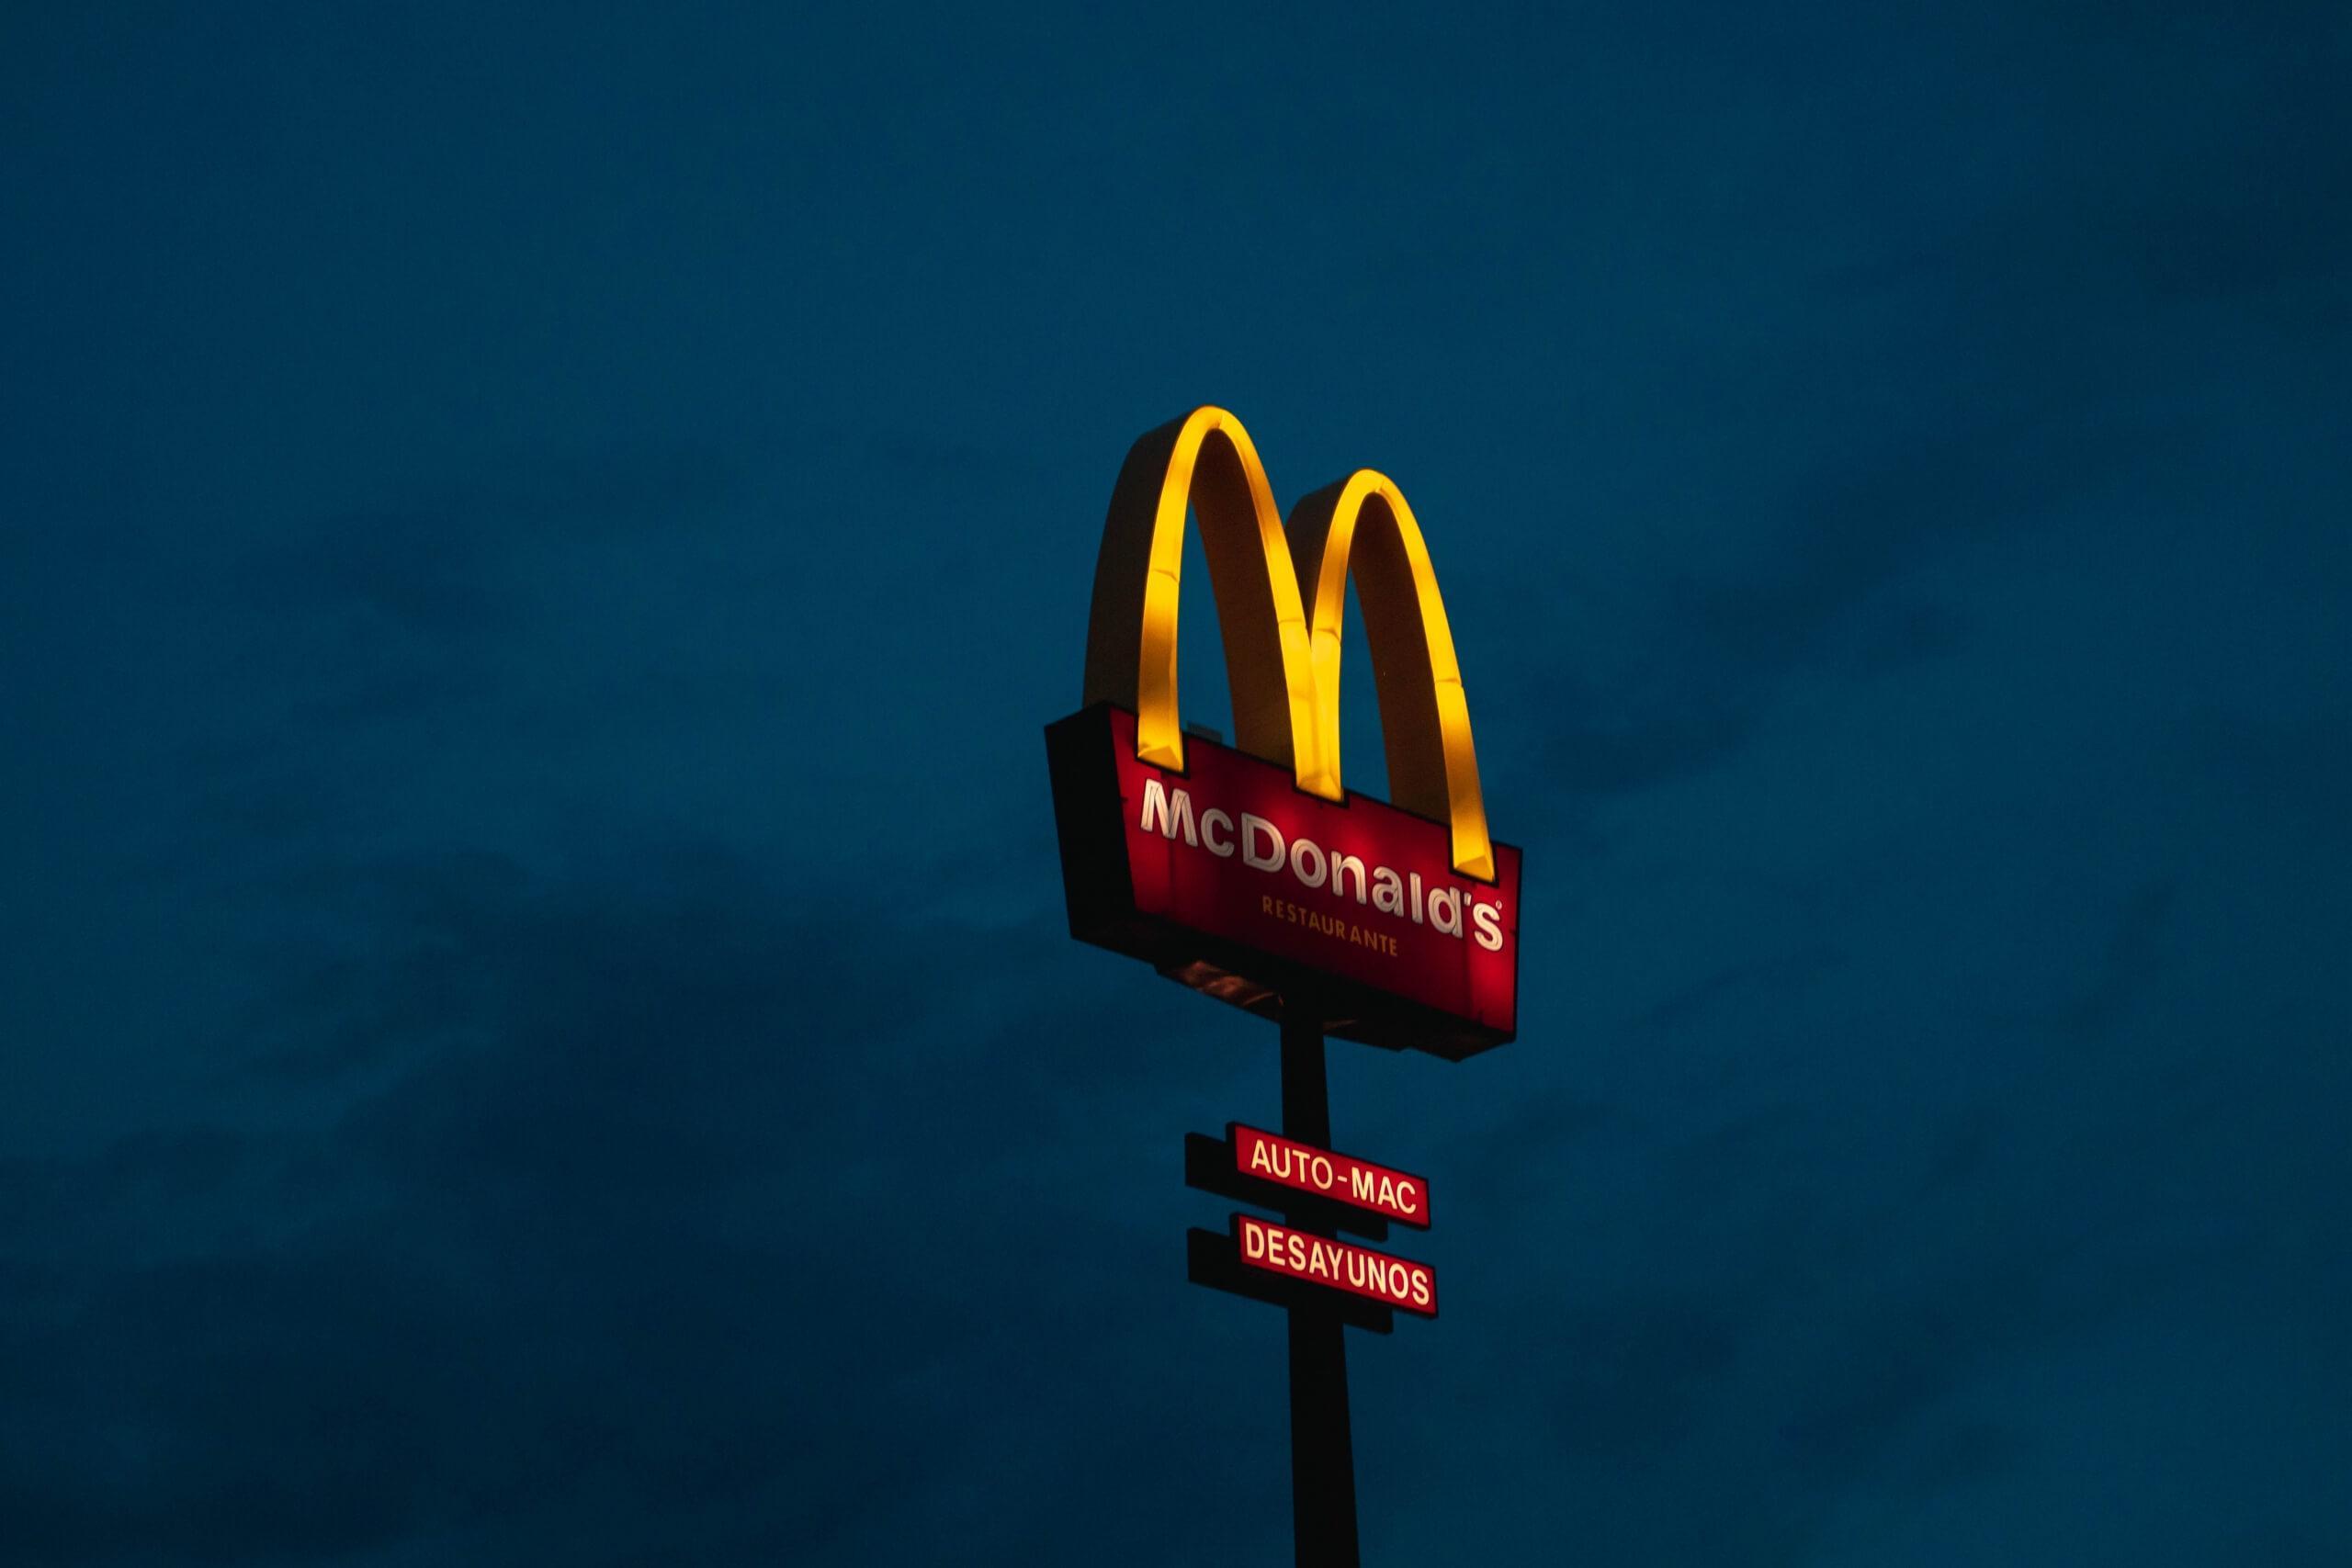 Mcdonalds leadership